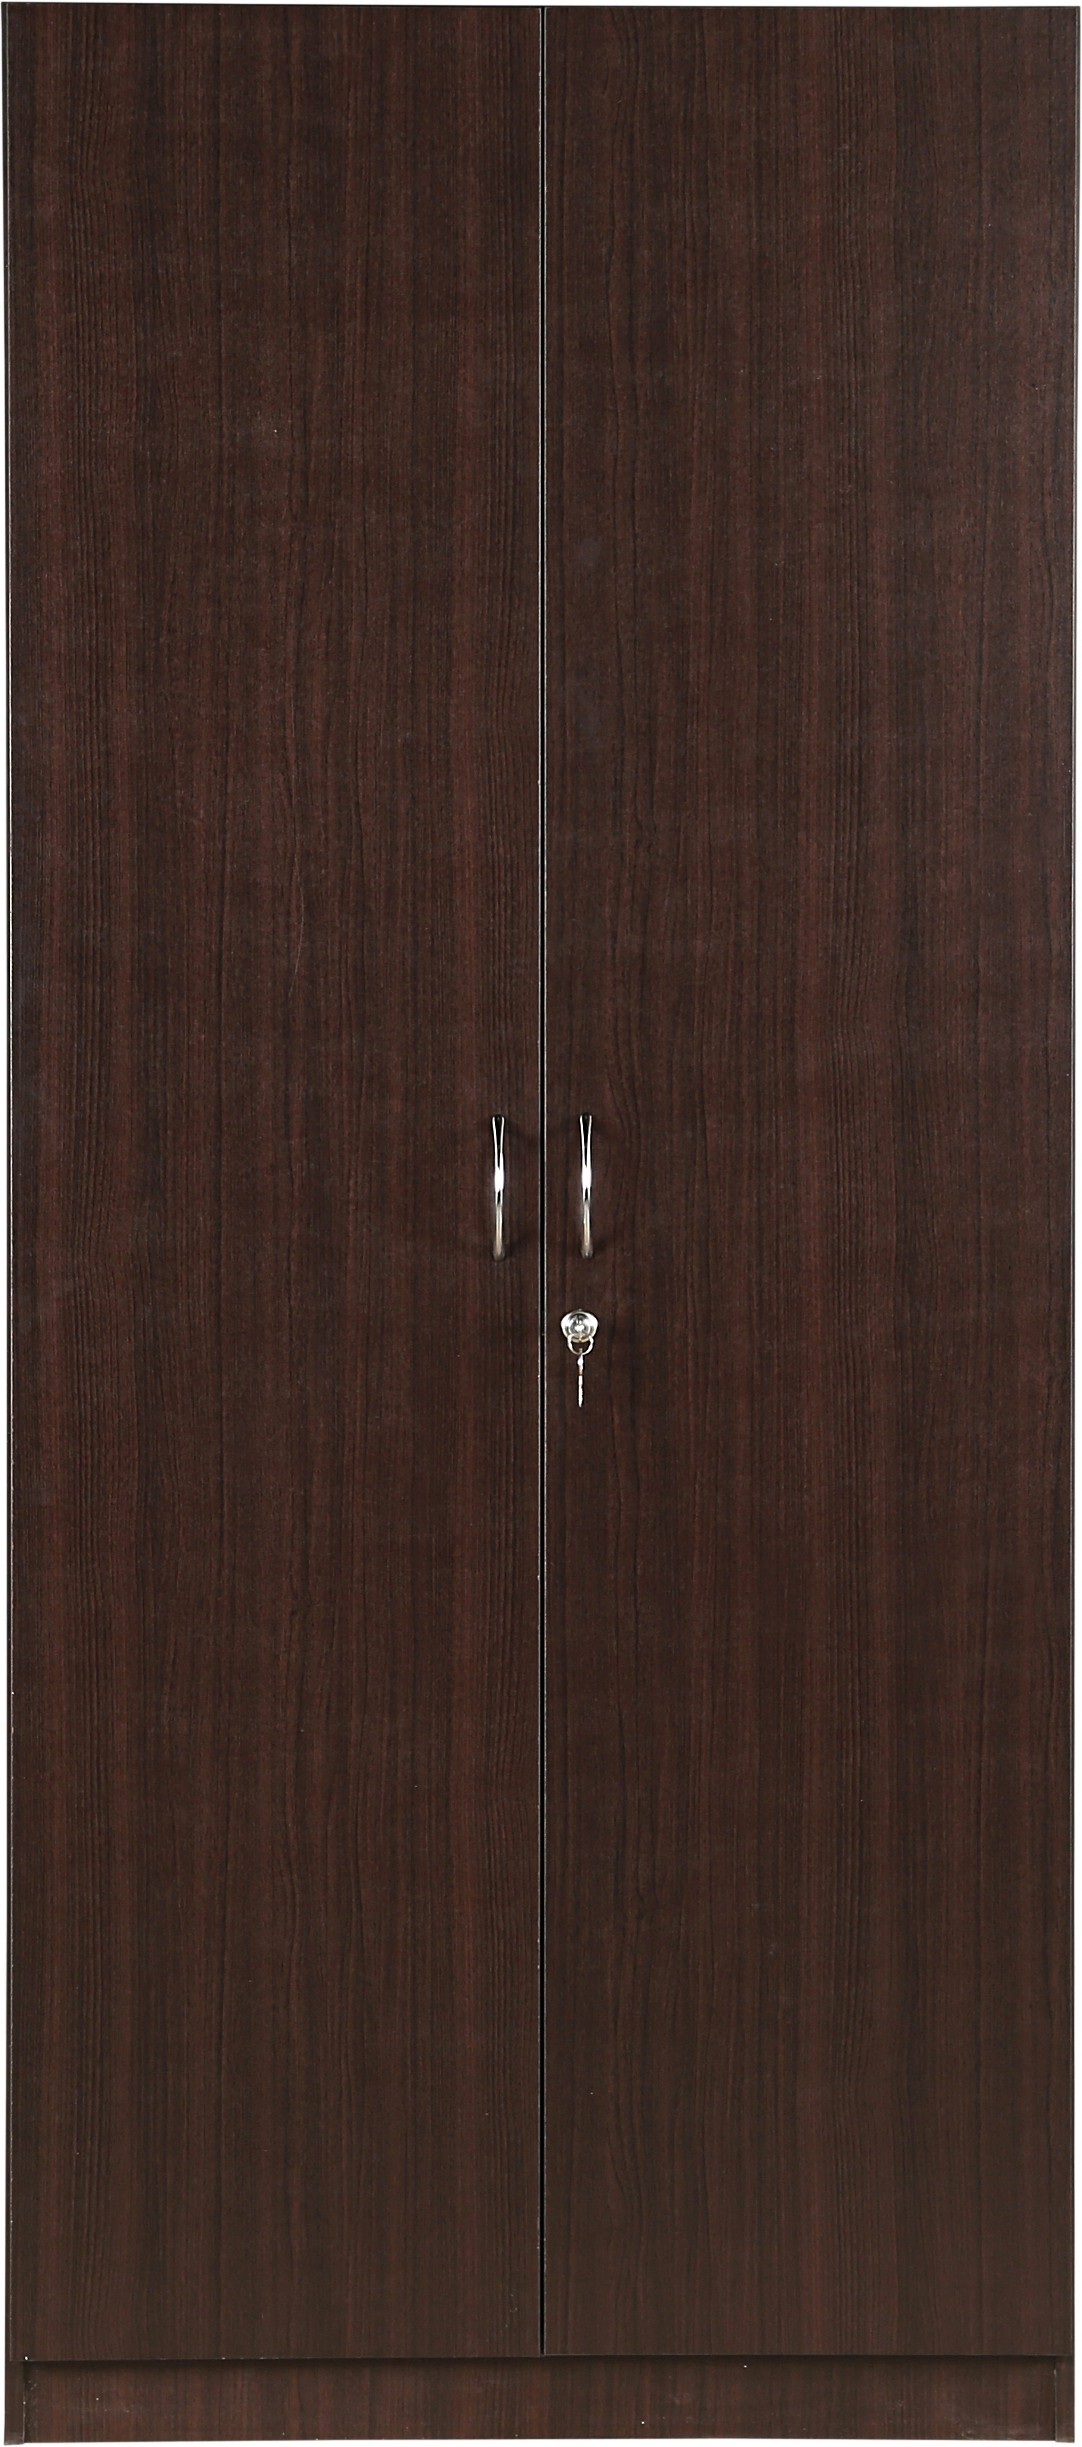 HomeTown Zina Engineered Wood 2 Door Modular Closet(Finish Color - Walnut)